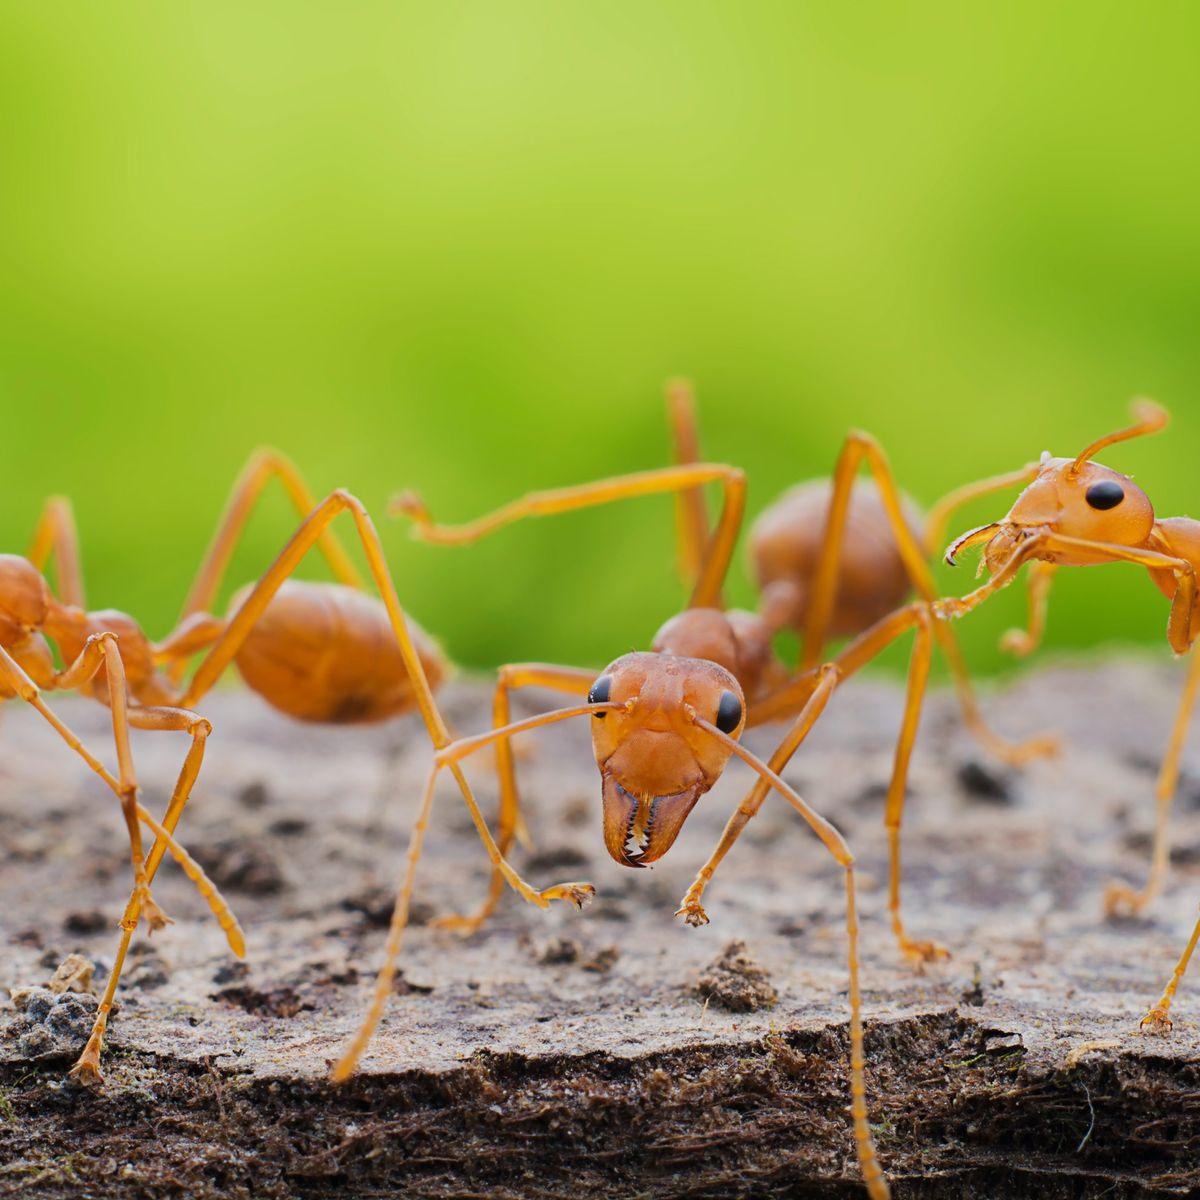 10 Best Ant Killers 2019 The Strategist New York Magazine